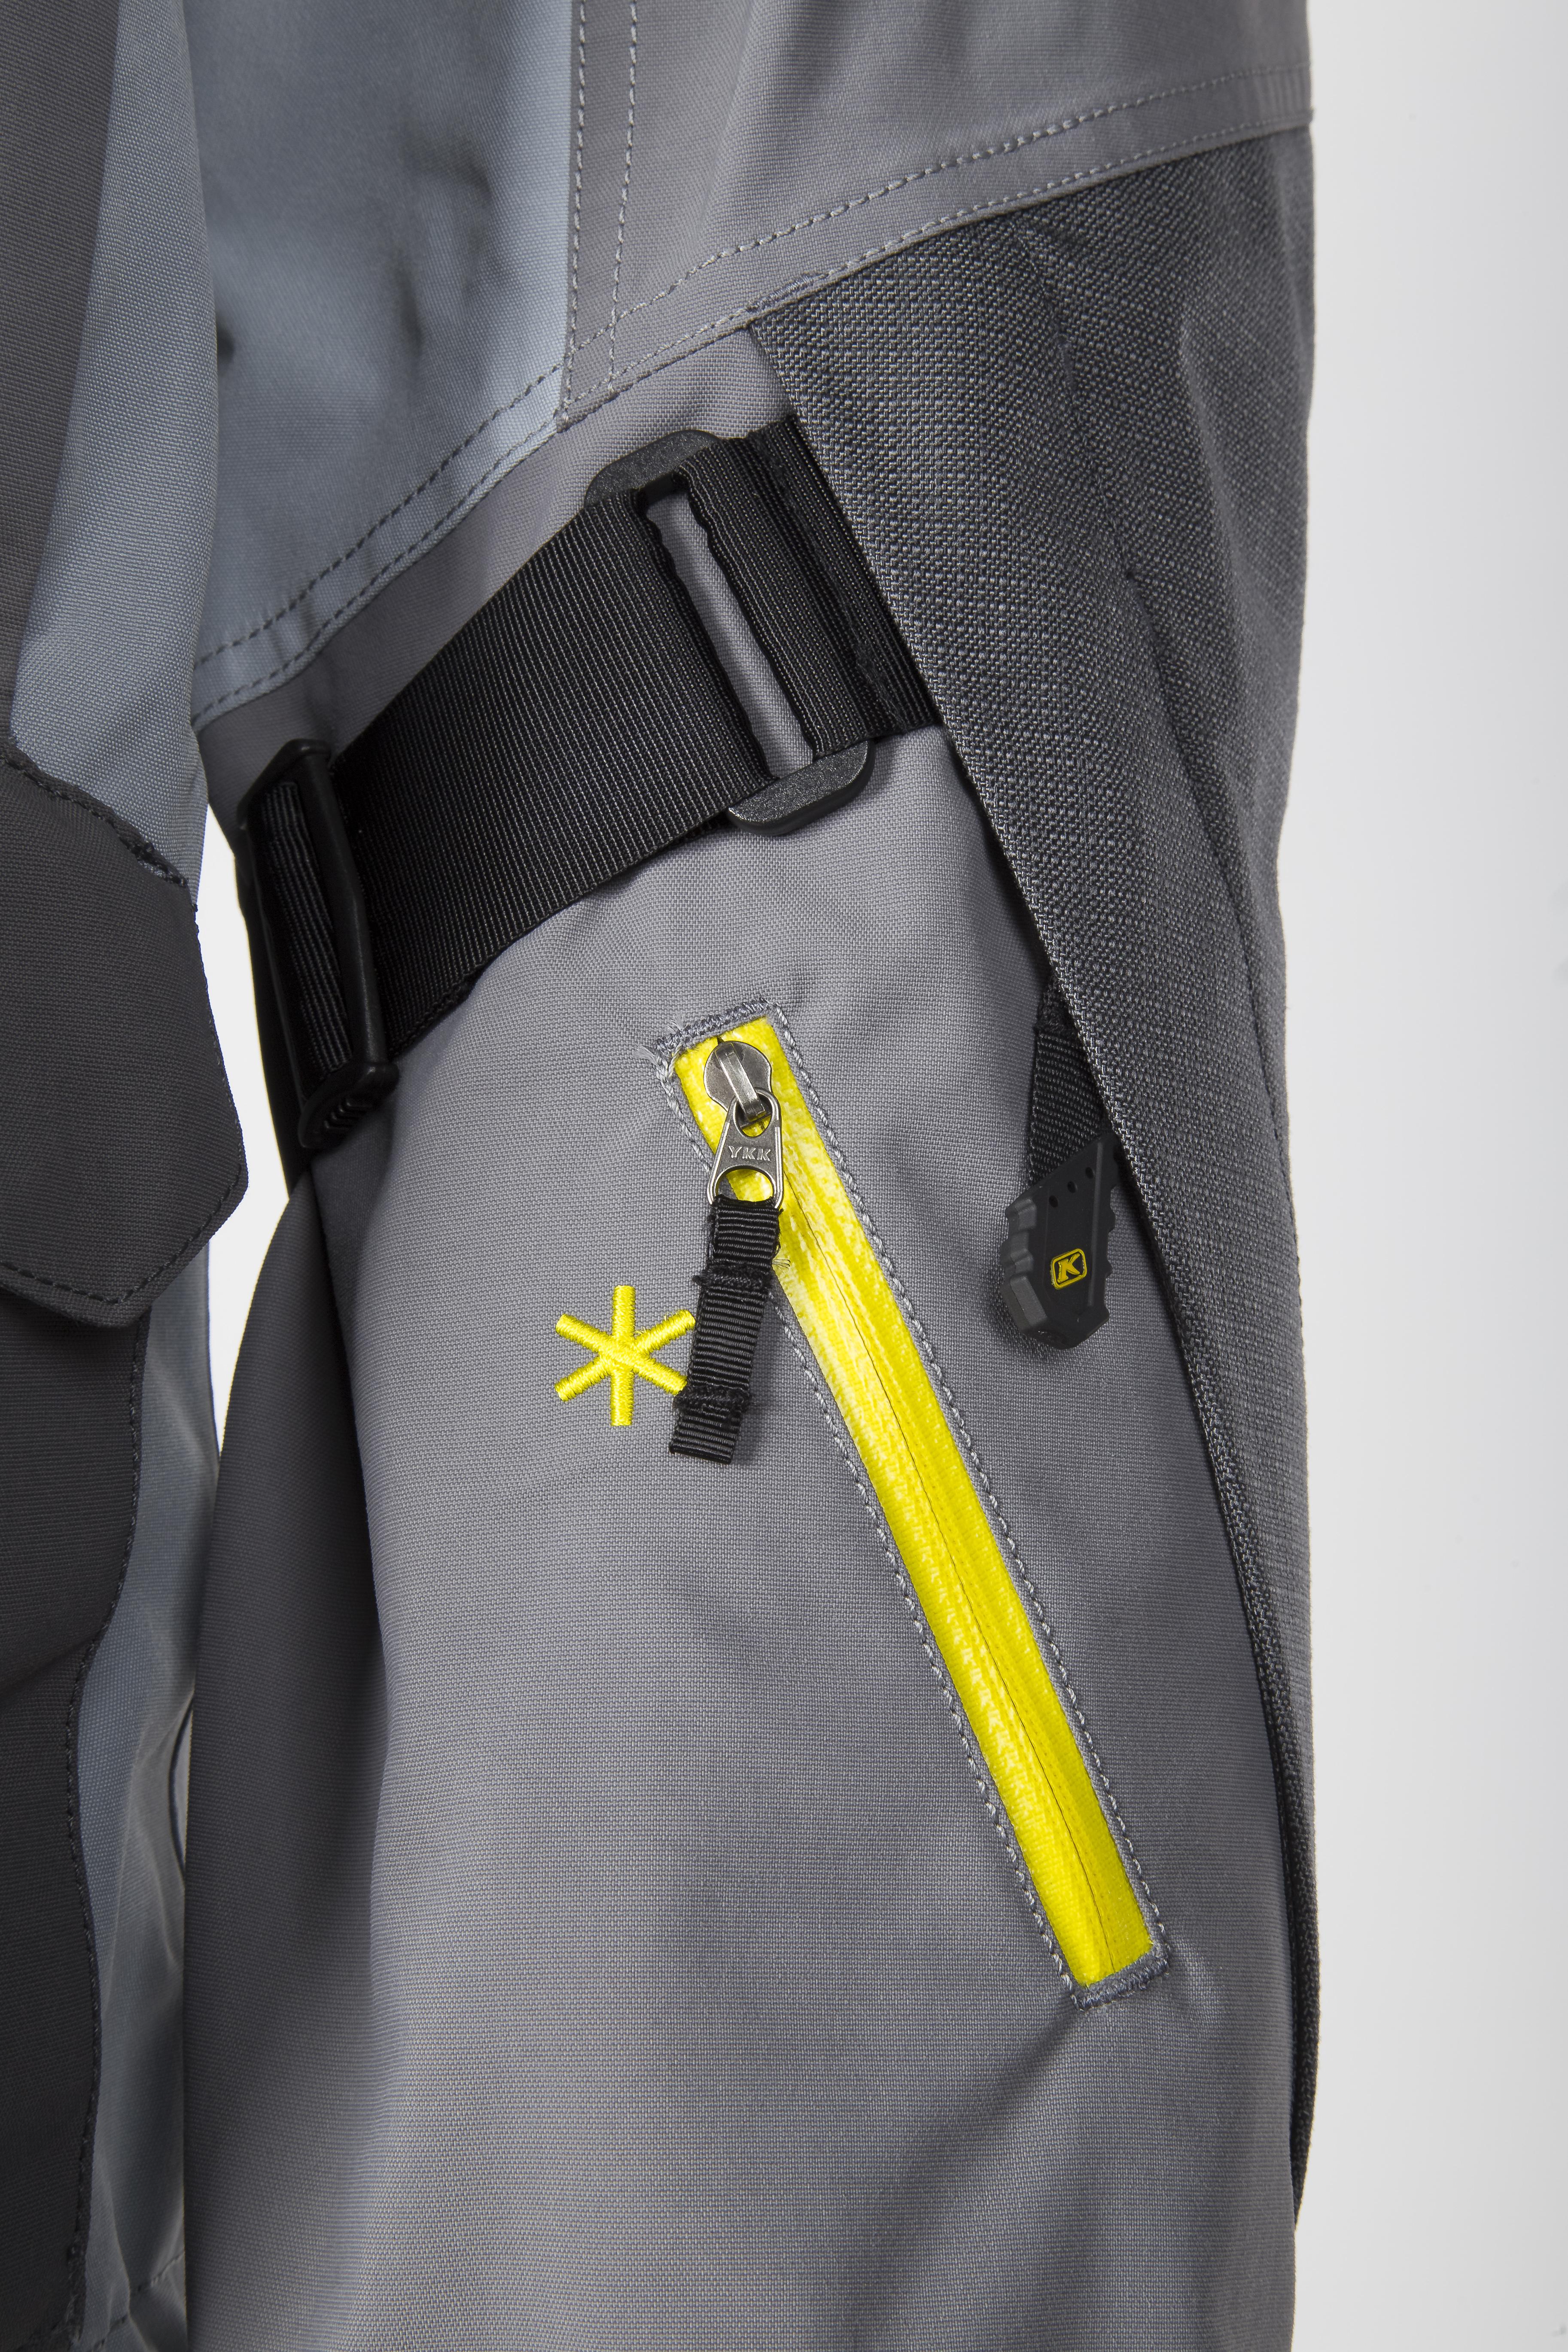 6029-001-600 Carlsbad Jacket D3